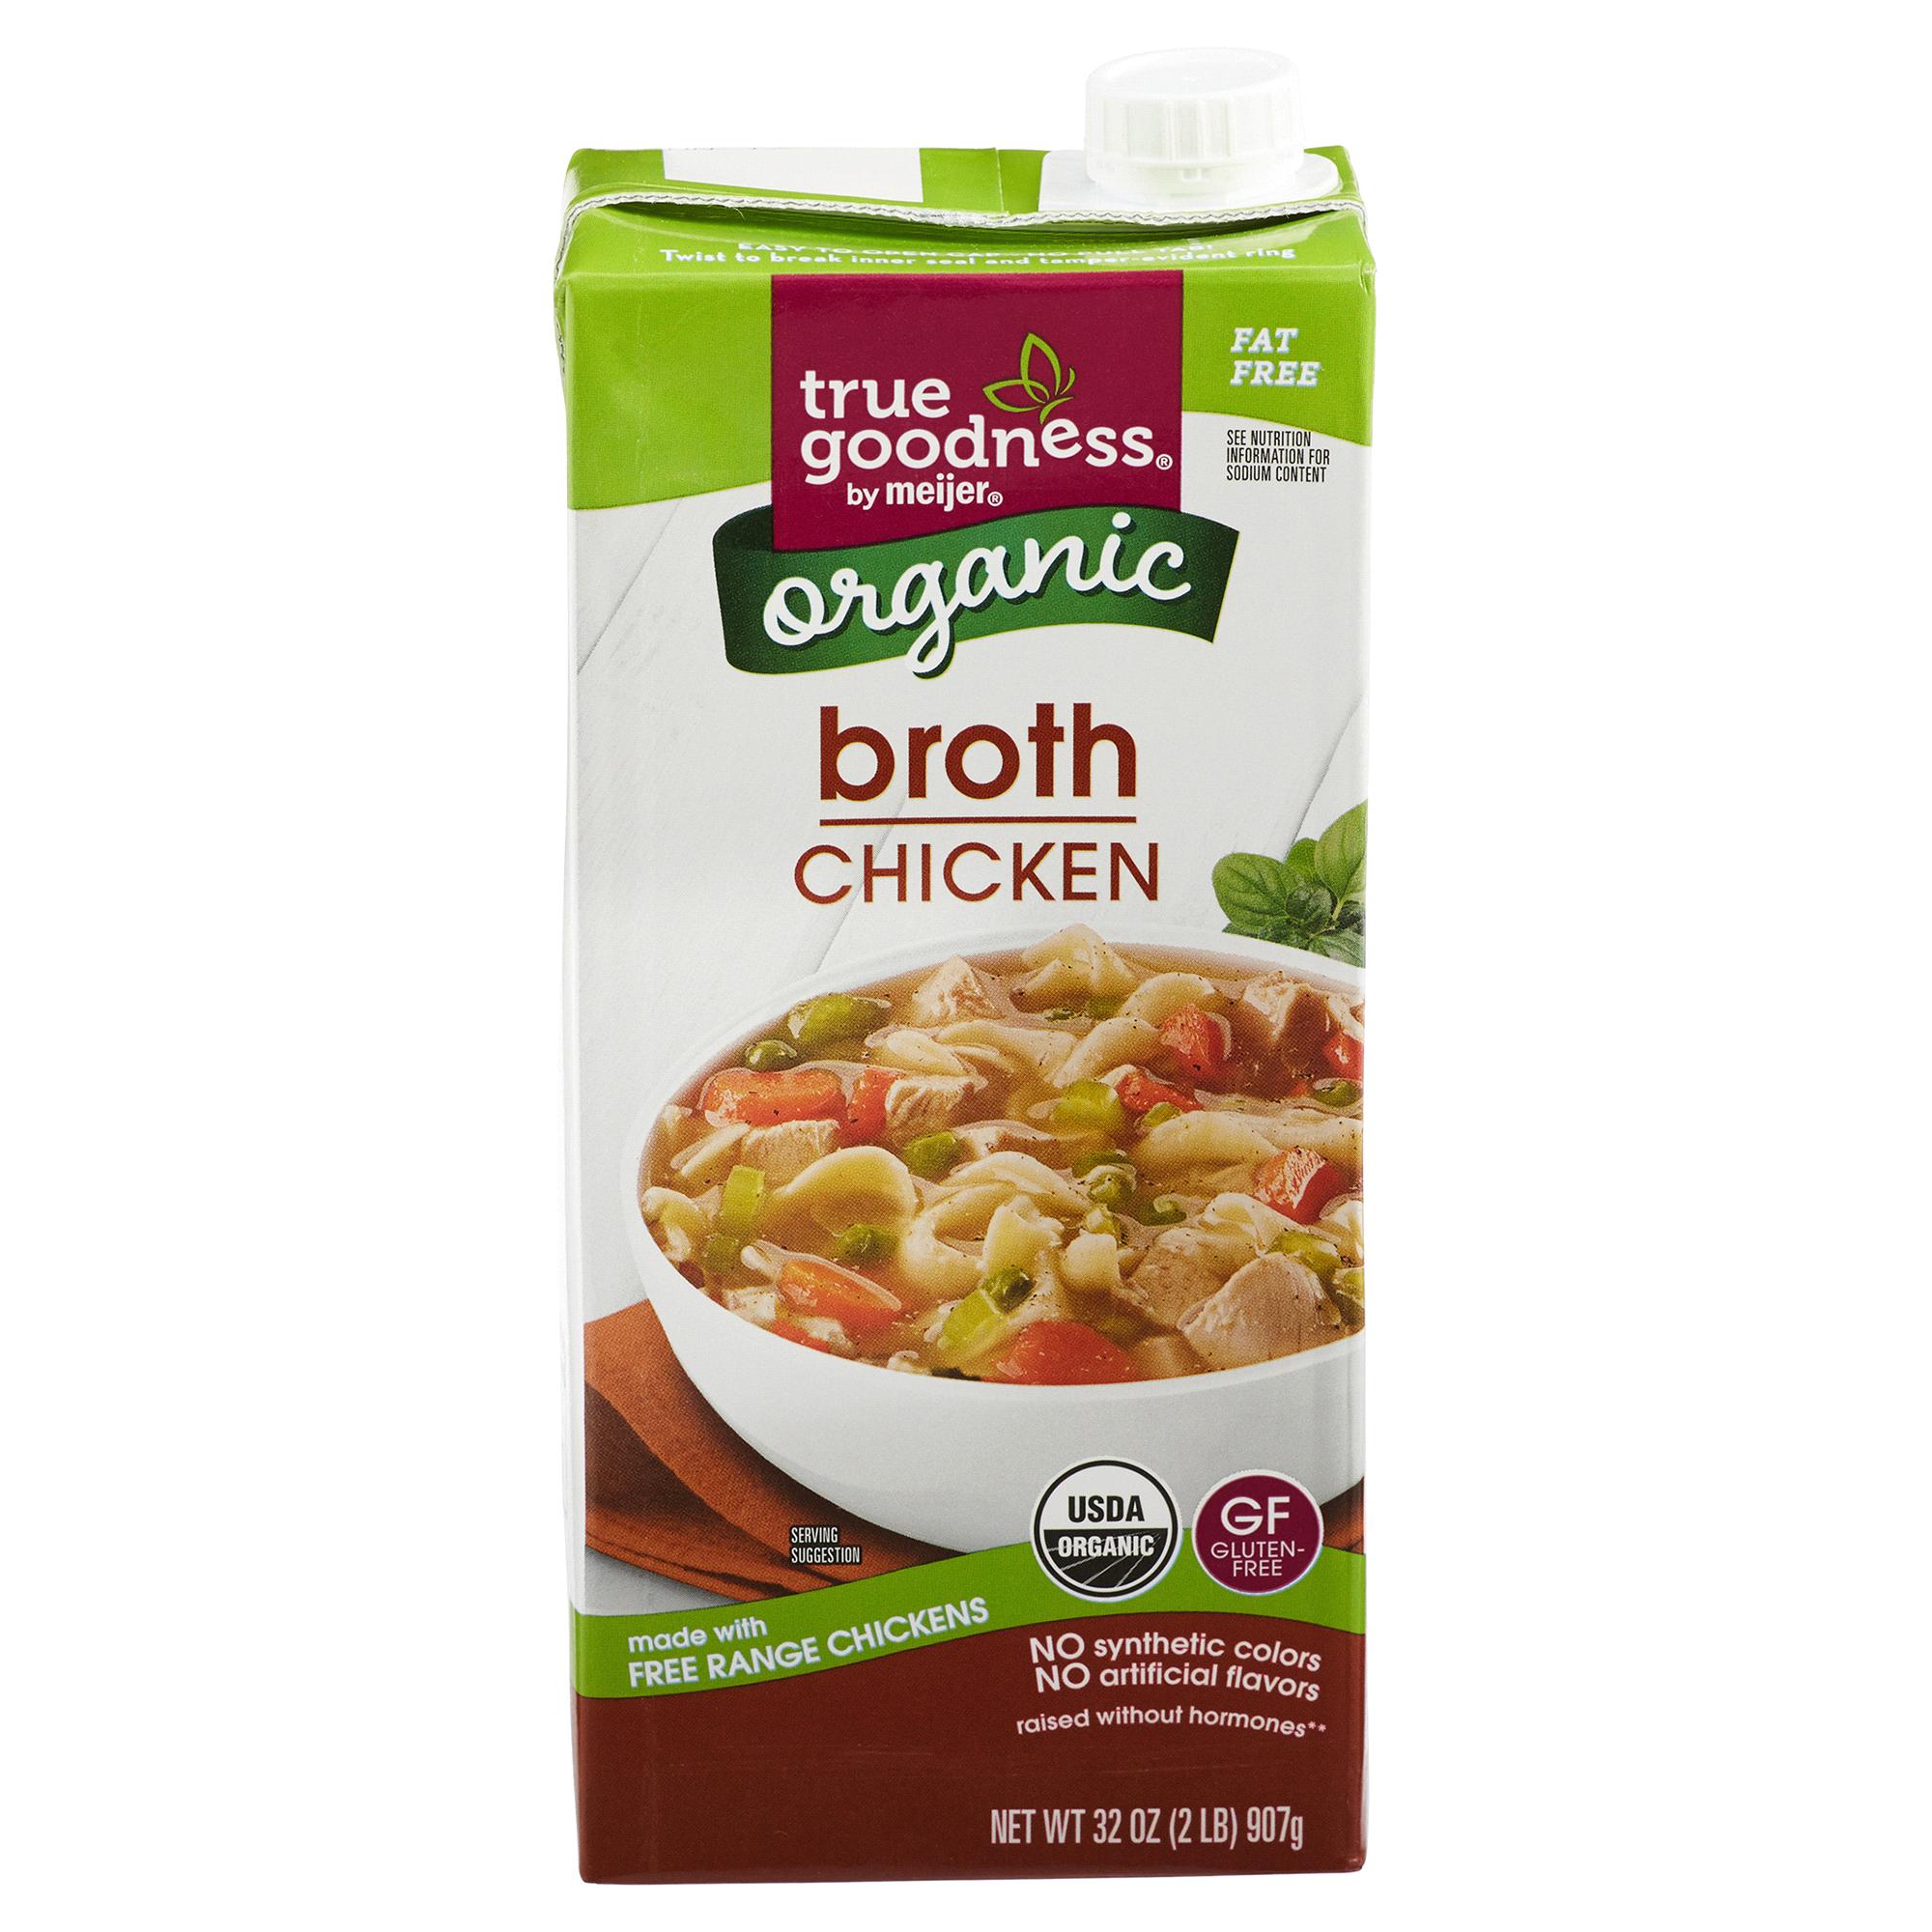 True Goodness Organic Chicken Broth 32 oz | Meijer.com